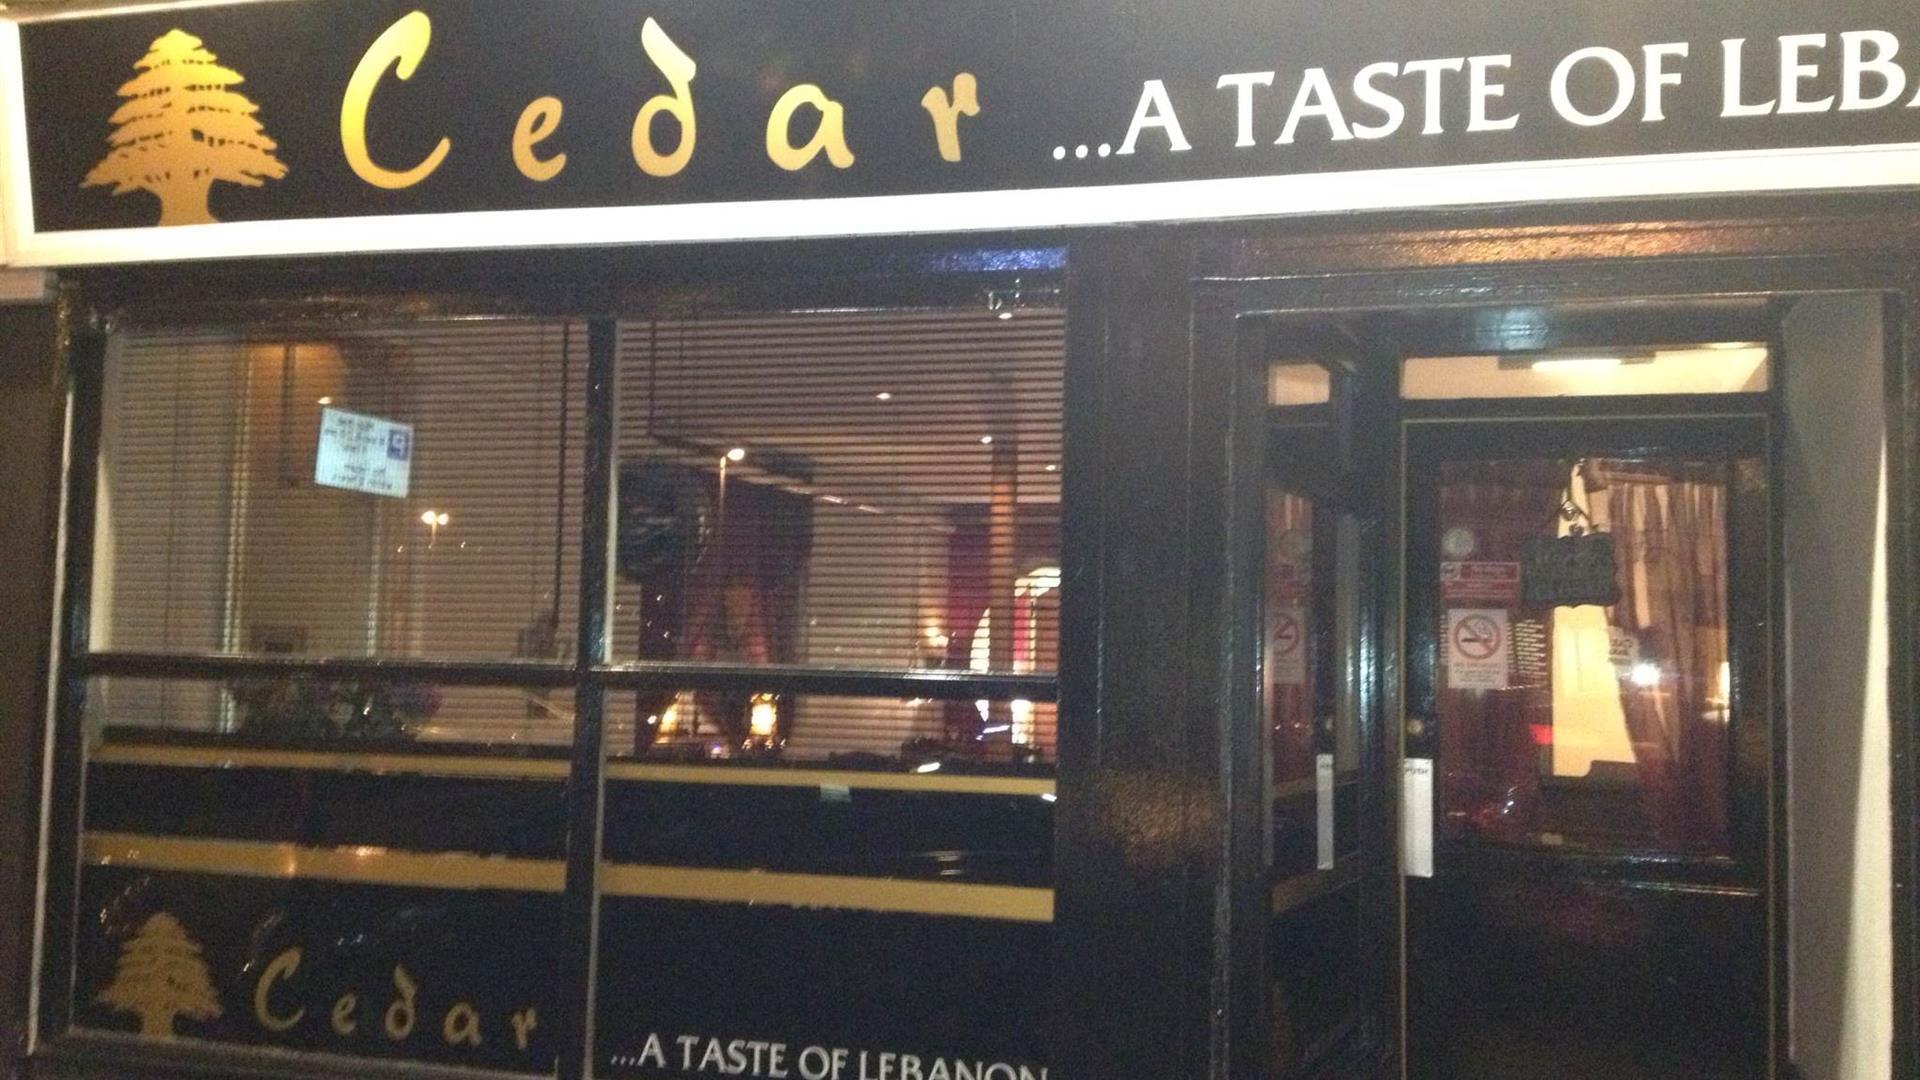 Cedar - A Taste of Lebanon